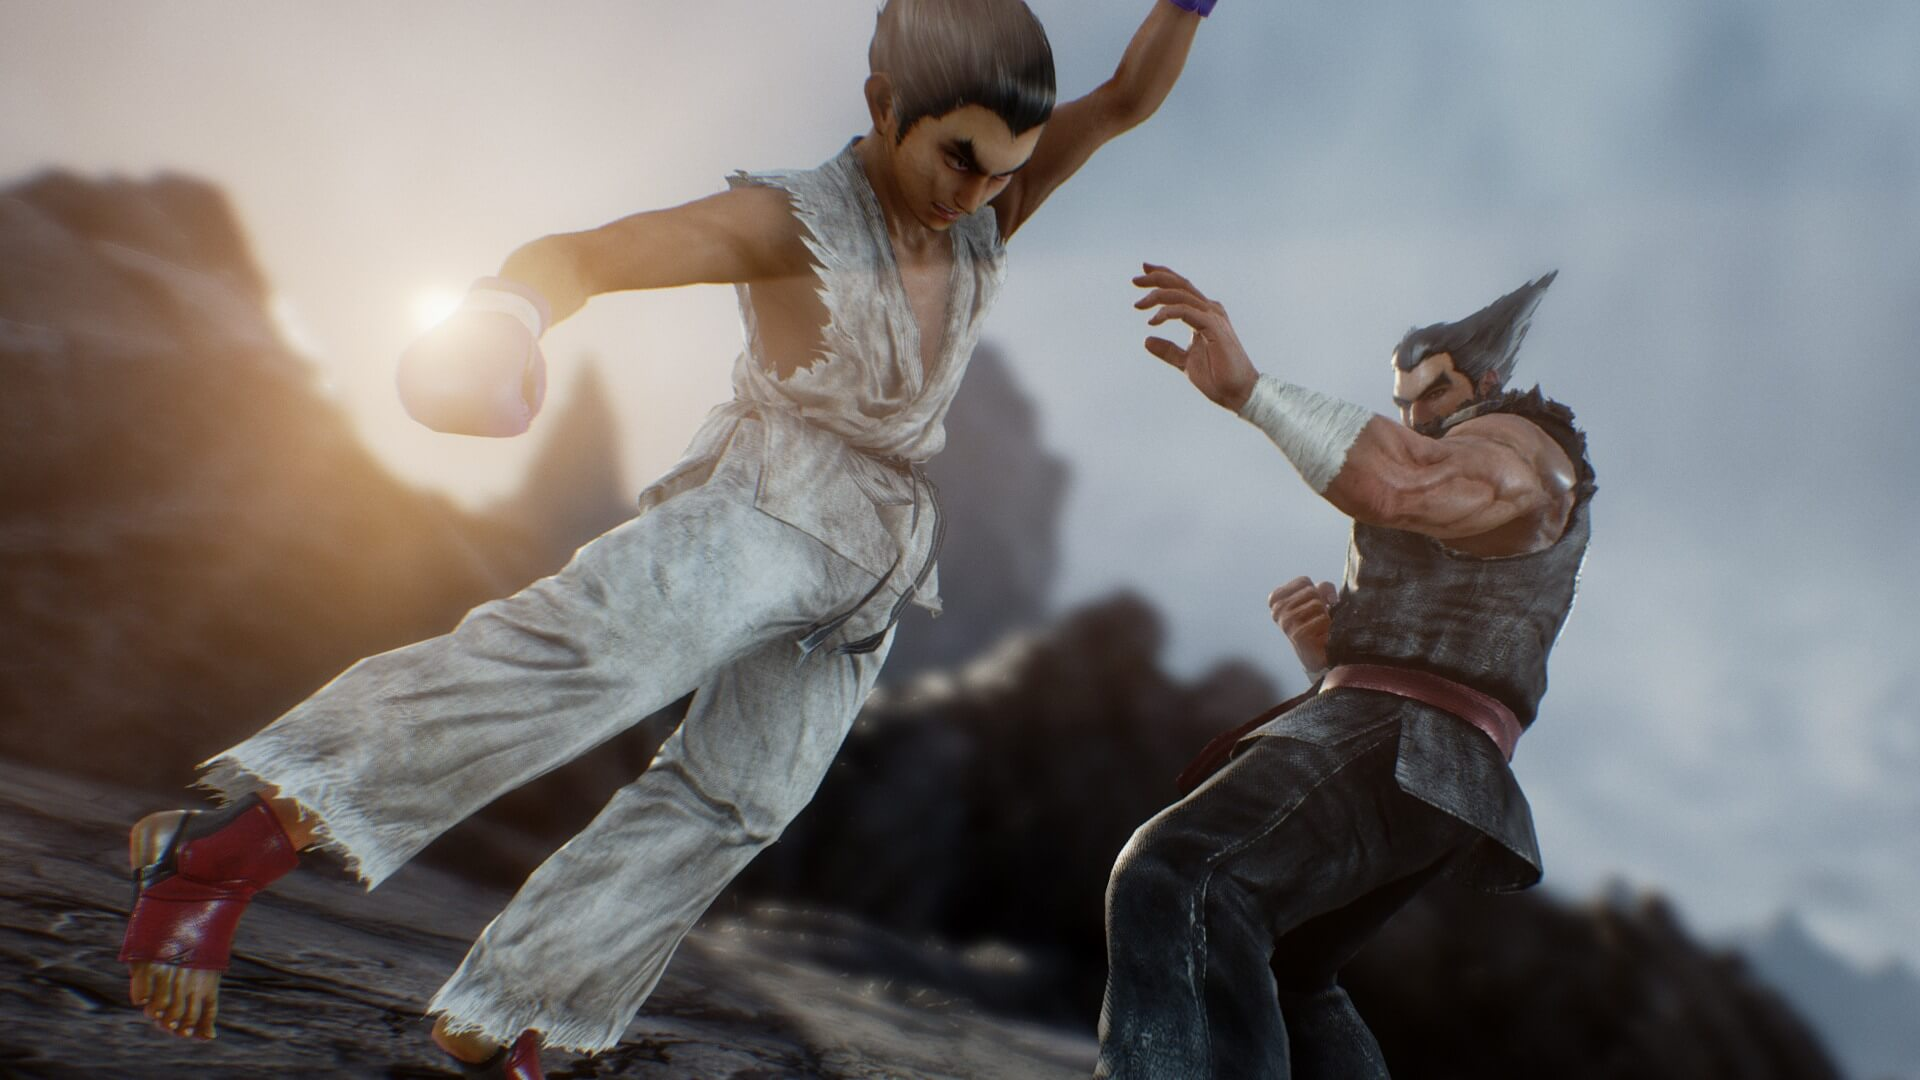 Tekken 7 Review | The Iron Fist Returns - The Game Fanatics